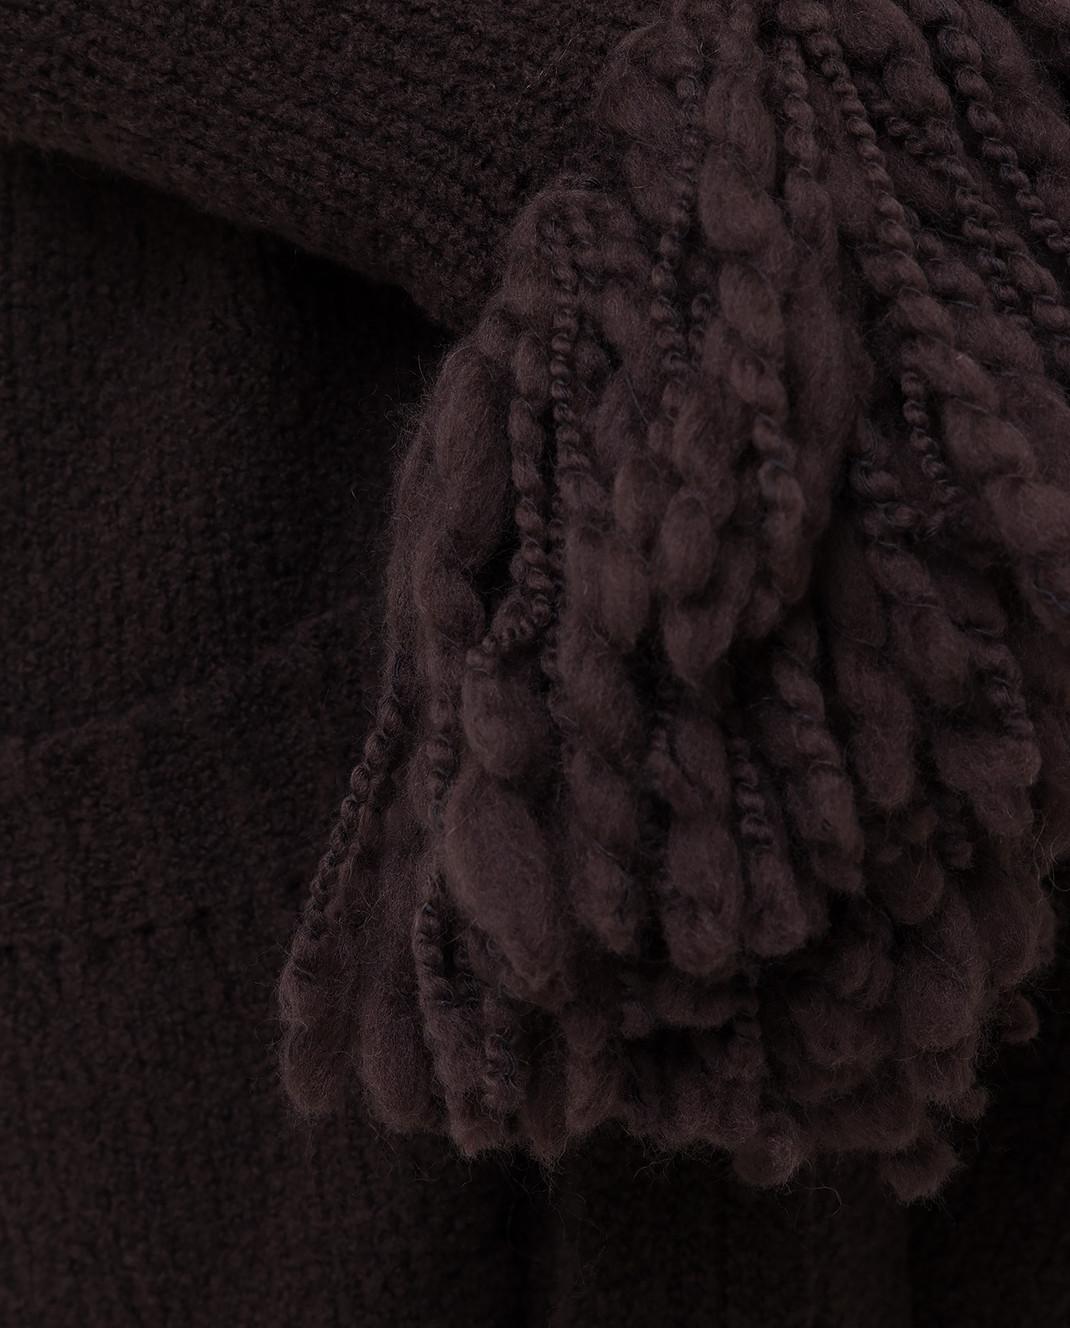 Bottega Veneta Коричневый кардиган из шерсти 525231 изображение 5